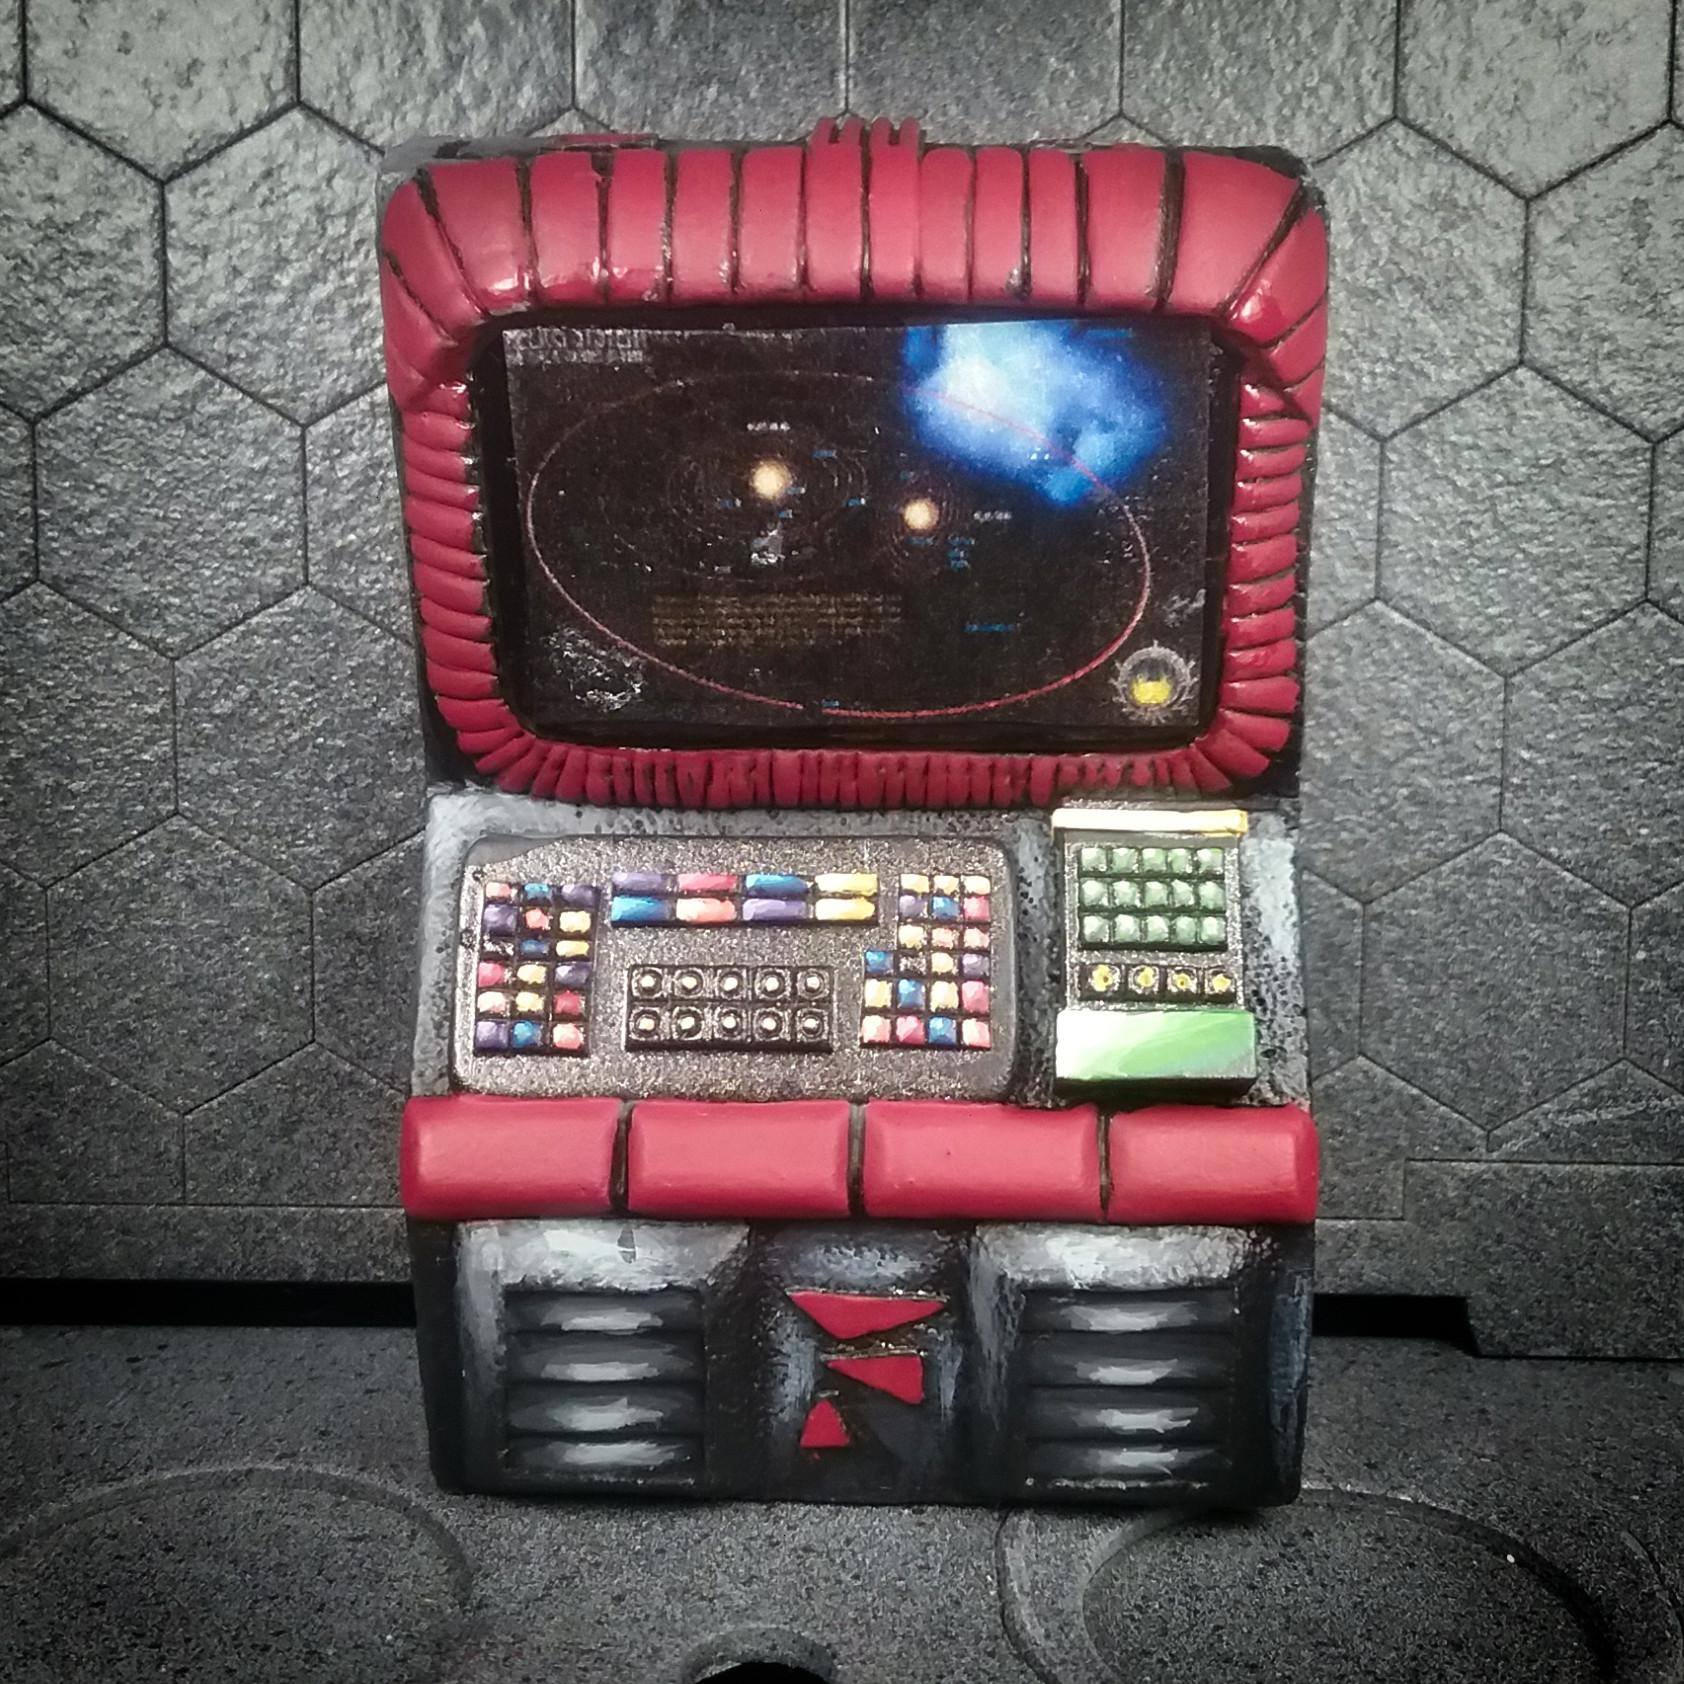 28mm Battlestar Galactica Miniatures, 28mm Sci Fi Scenics, Battlestar Galactica Miniatures, Battlestar Galactica Terrain, Sci Fi Terrain, Scotia Grendel, Space Terrain, Starship